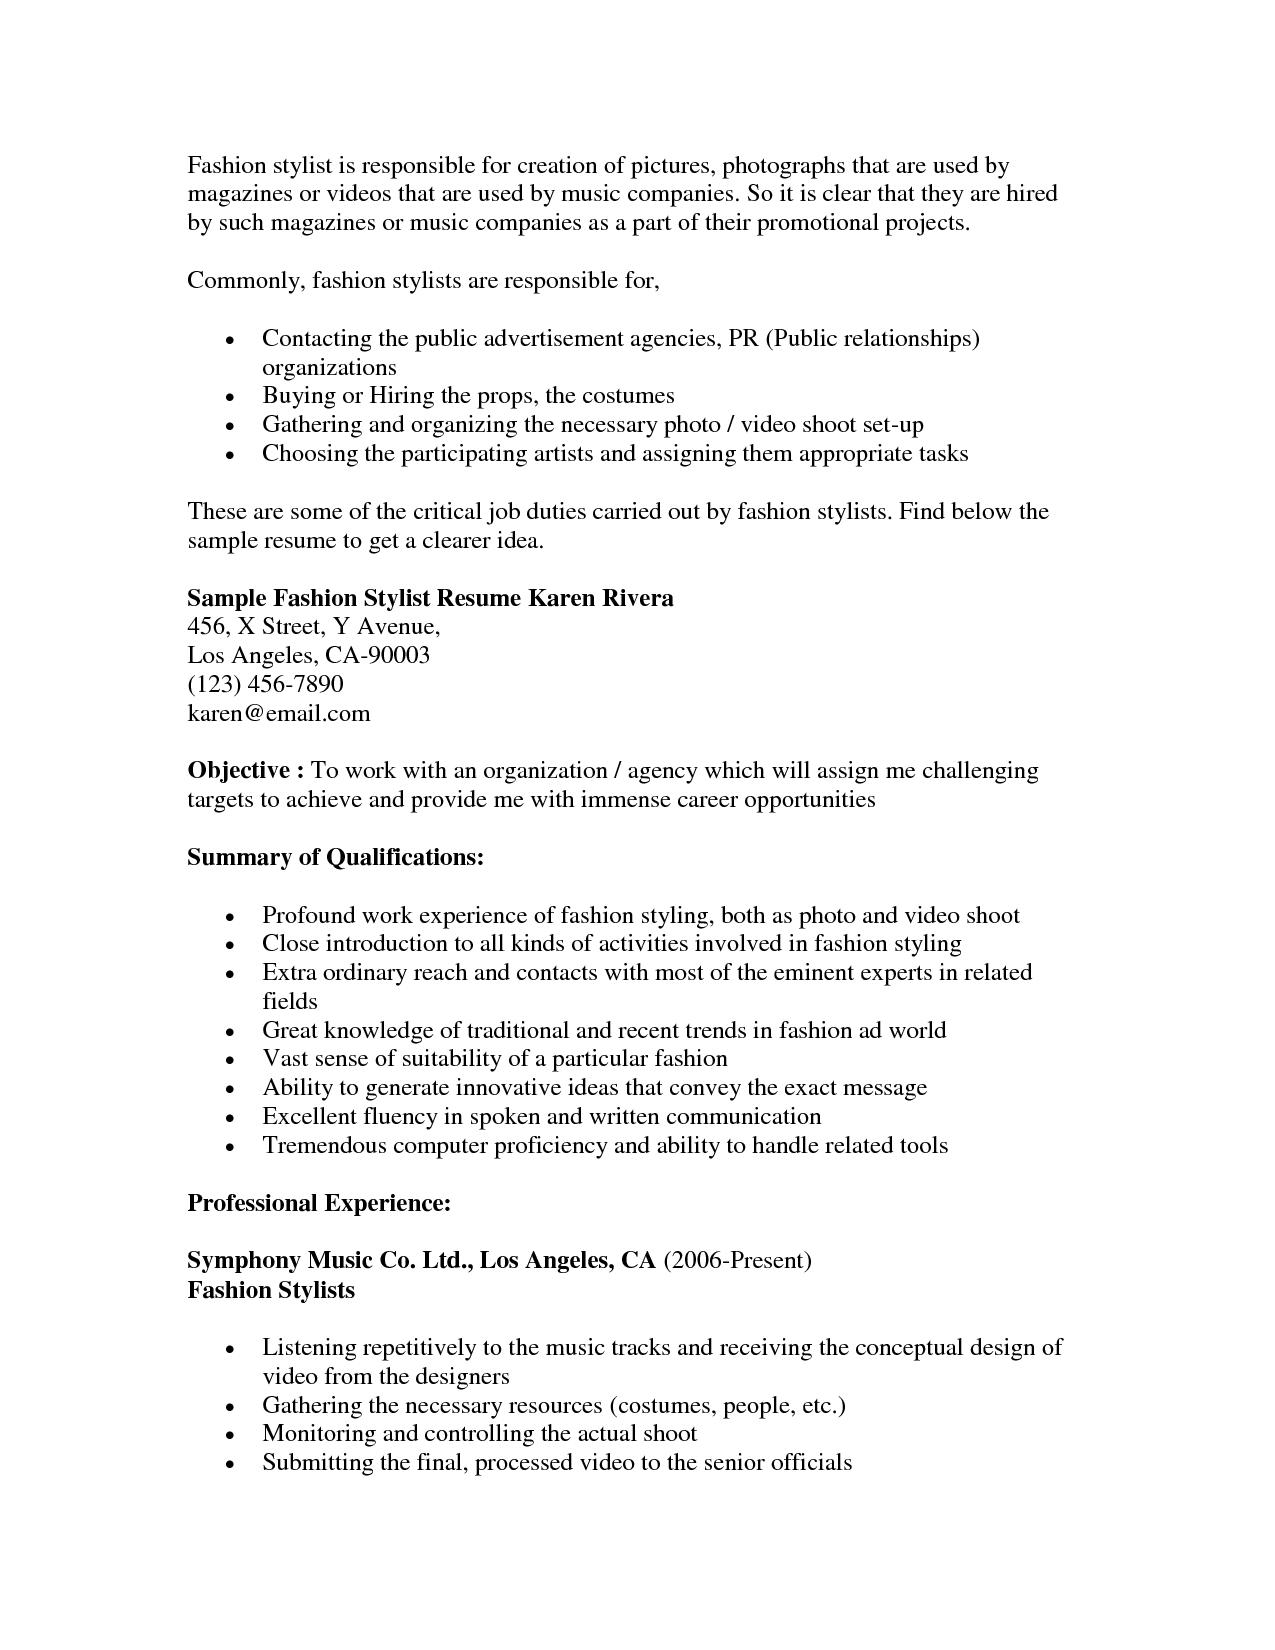 Fashion Stylist Resume Objective Resumecareer Info